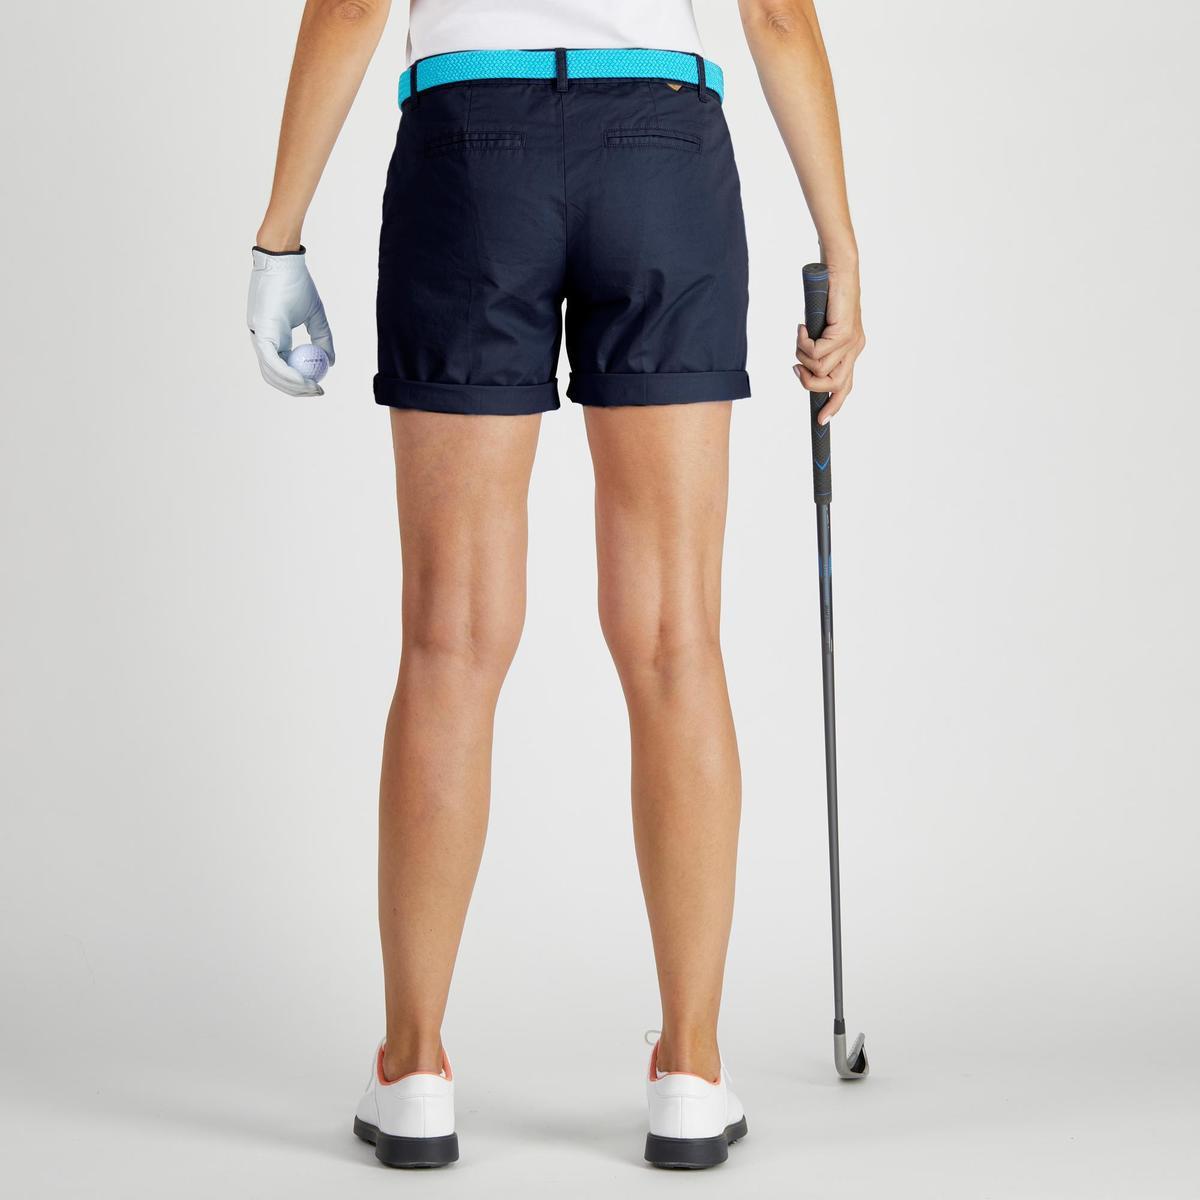 Bild 4 von Golf Bermuda Shorts 500 Damen marineblau